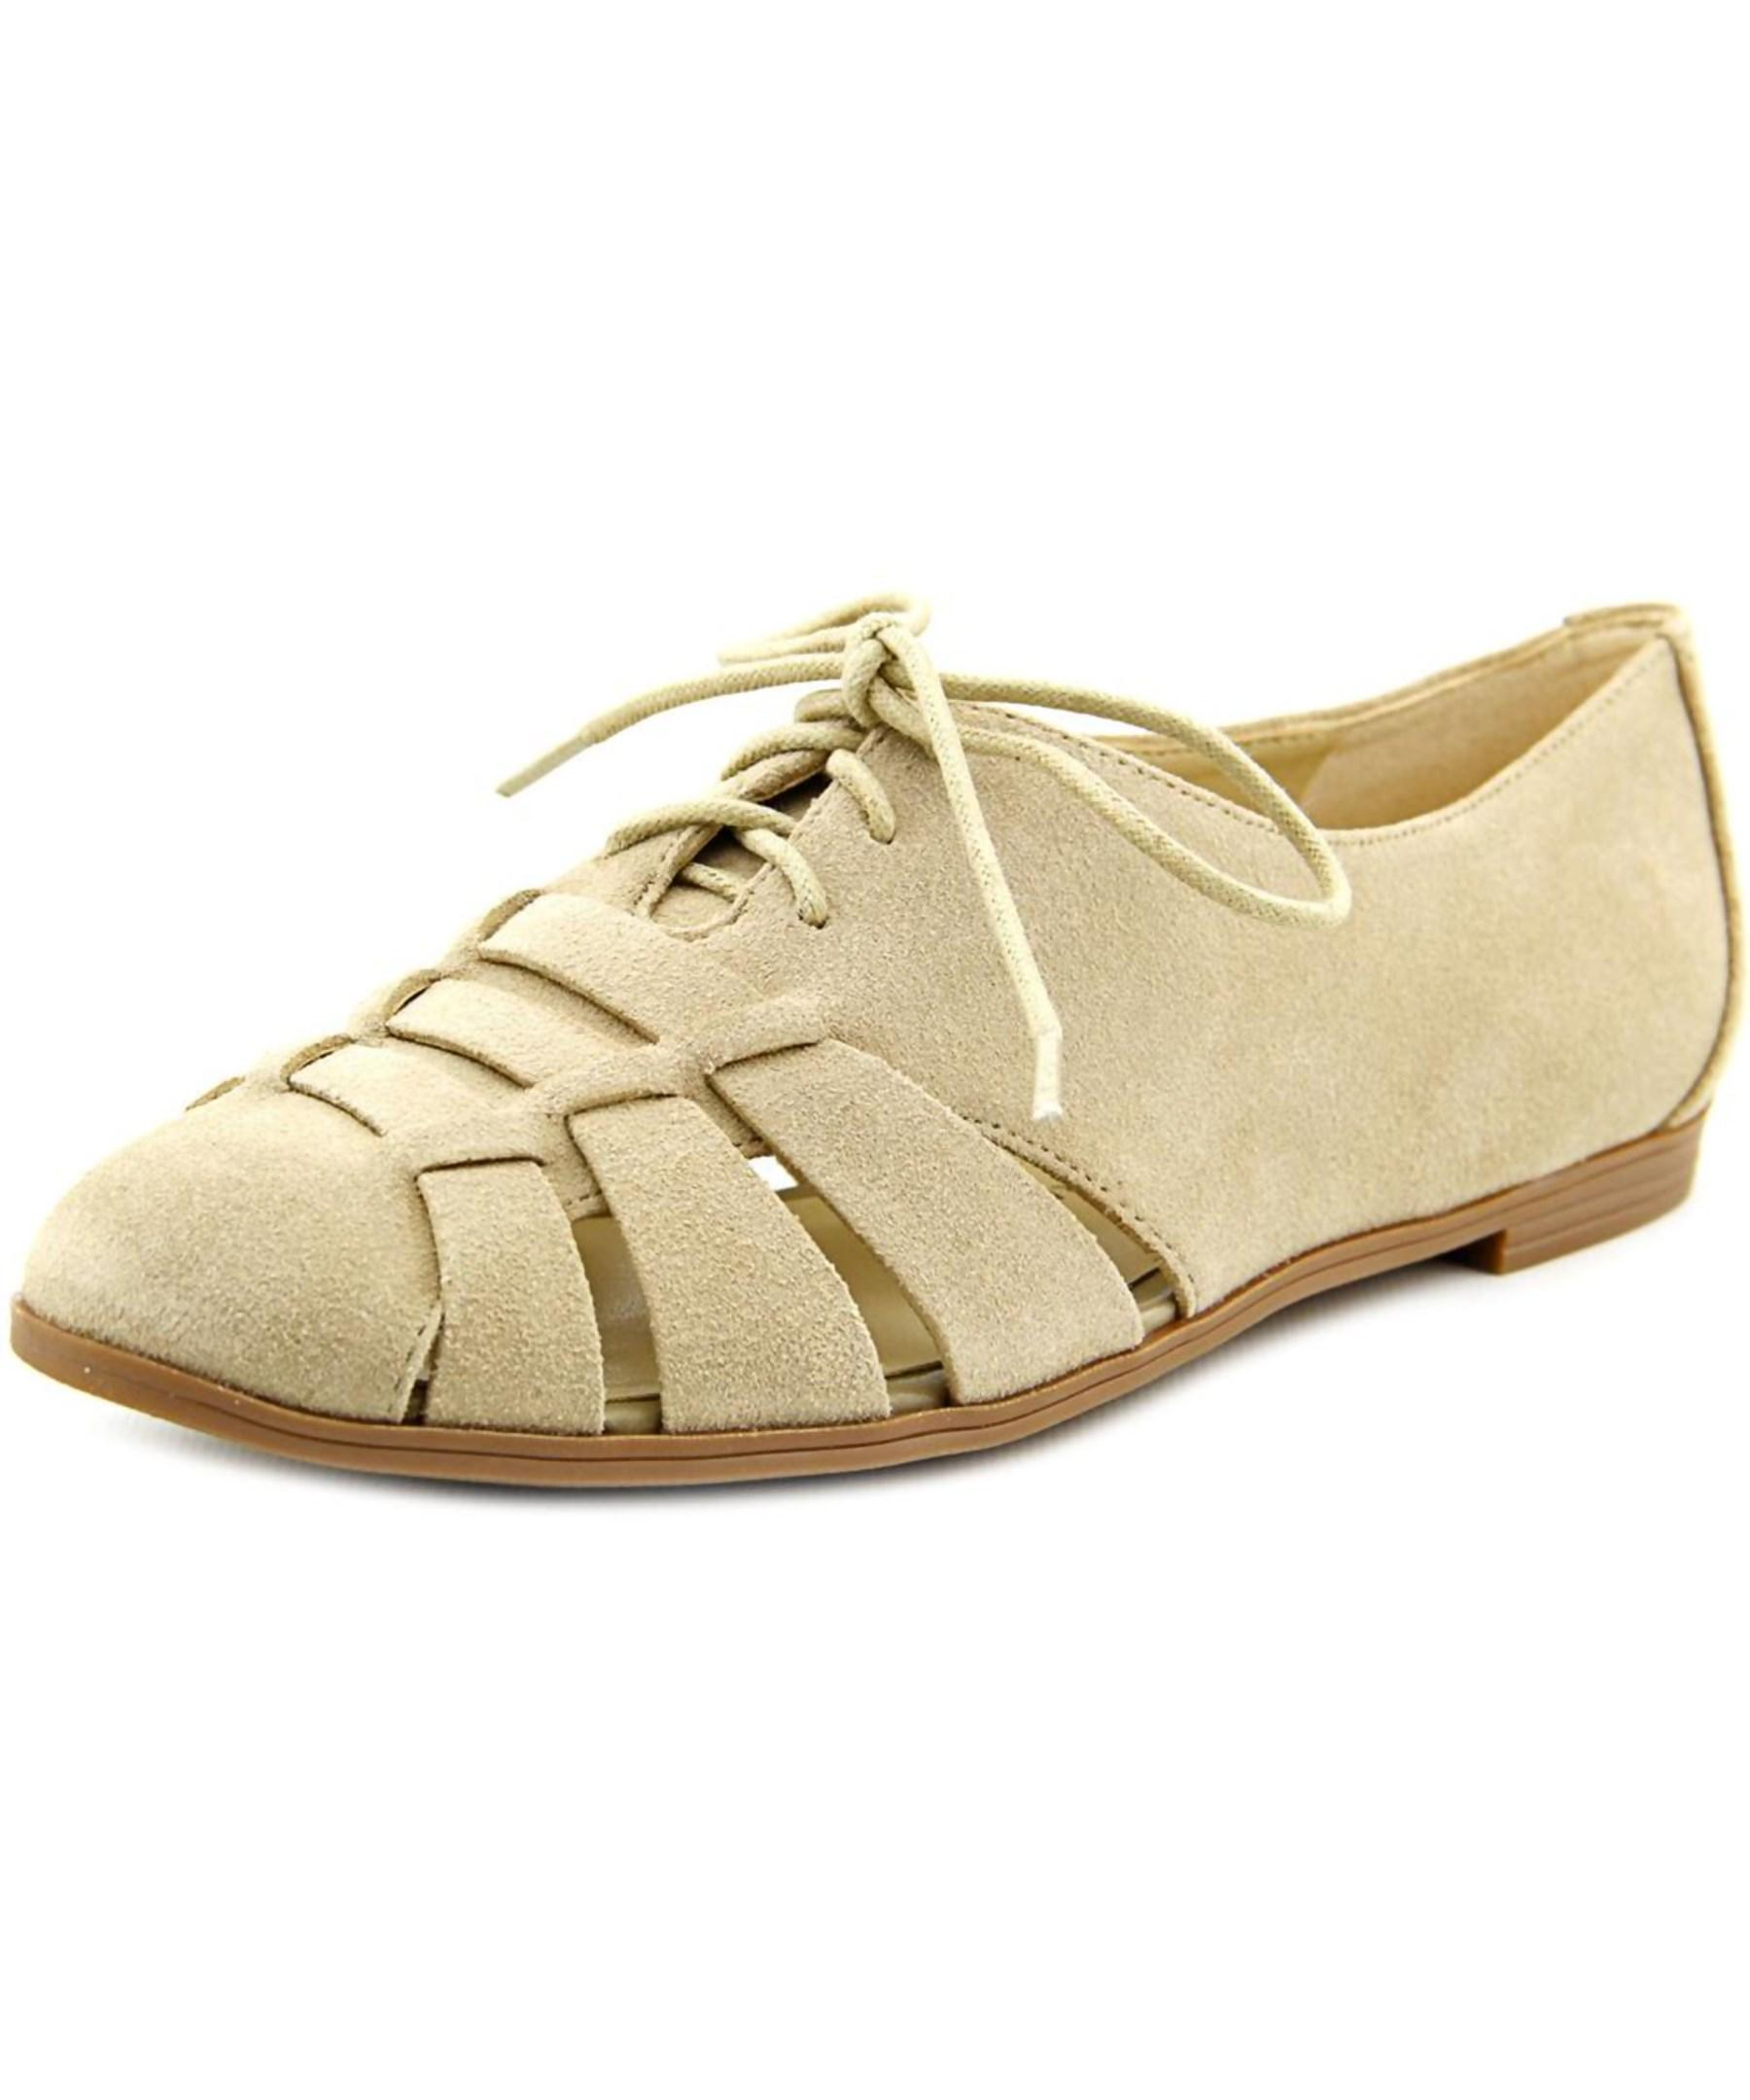 Isaac Mizrahi Oxford Women S Shoes